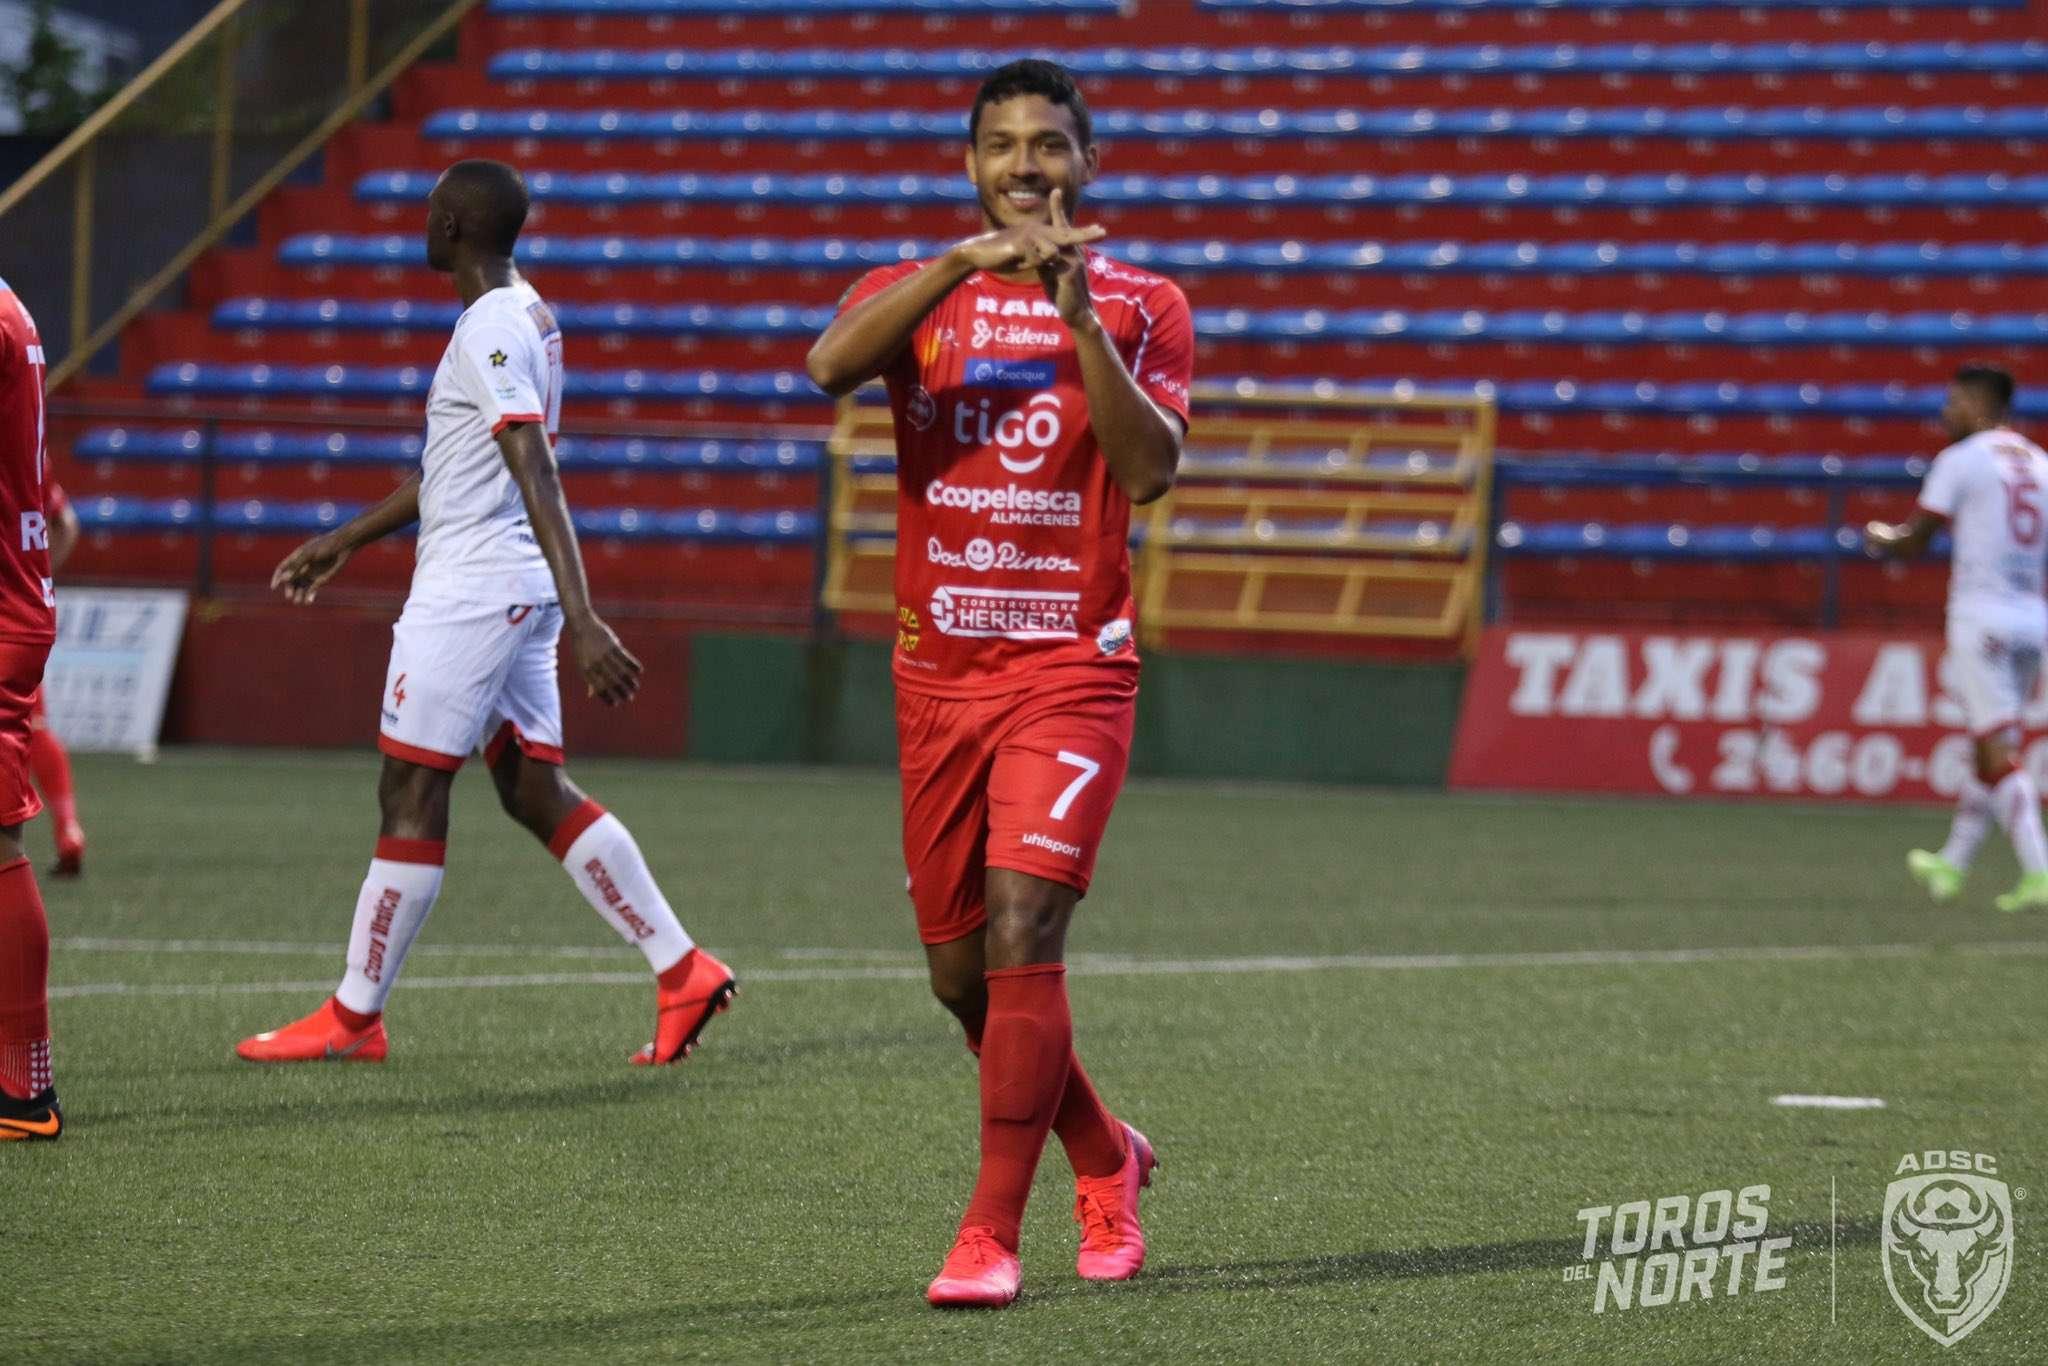 Jorman Aguilar celebra el gol anotado.